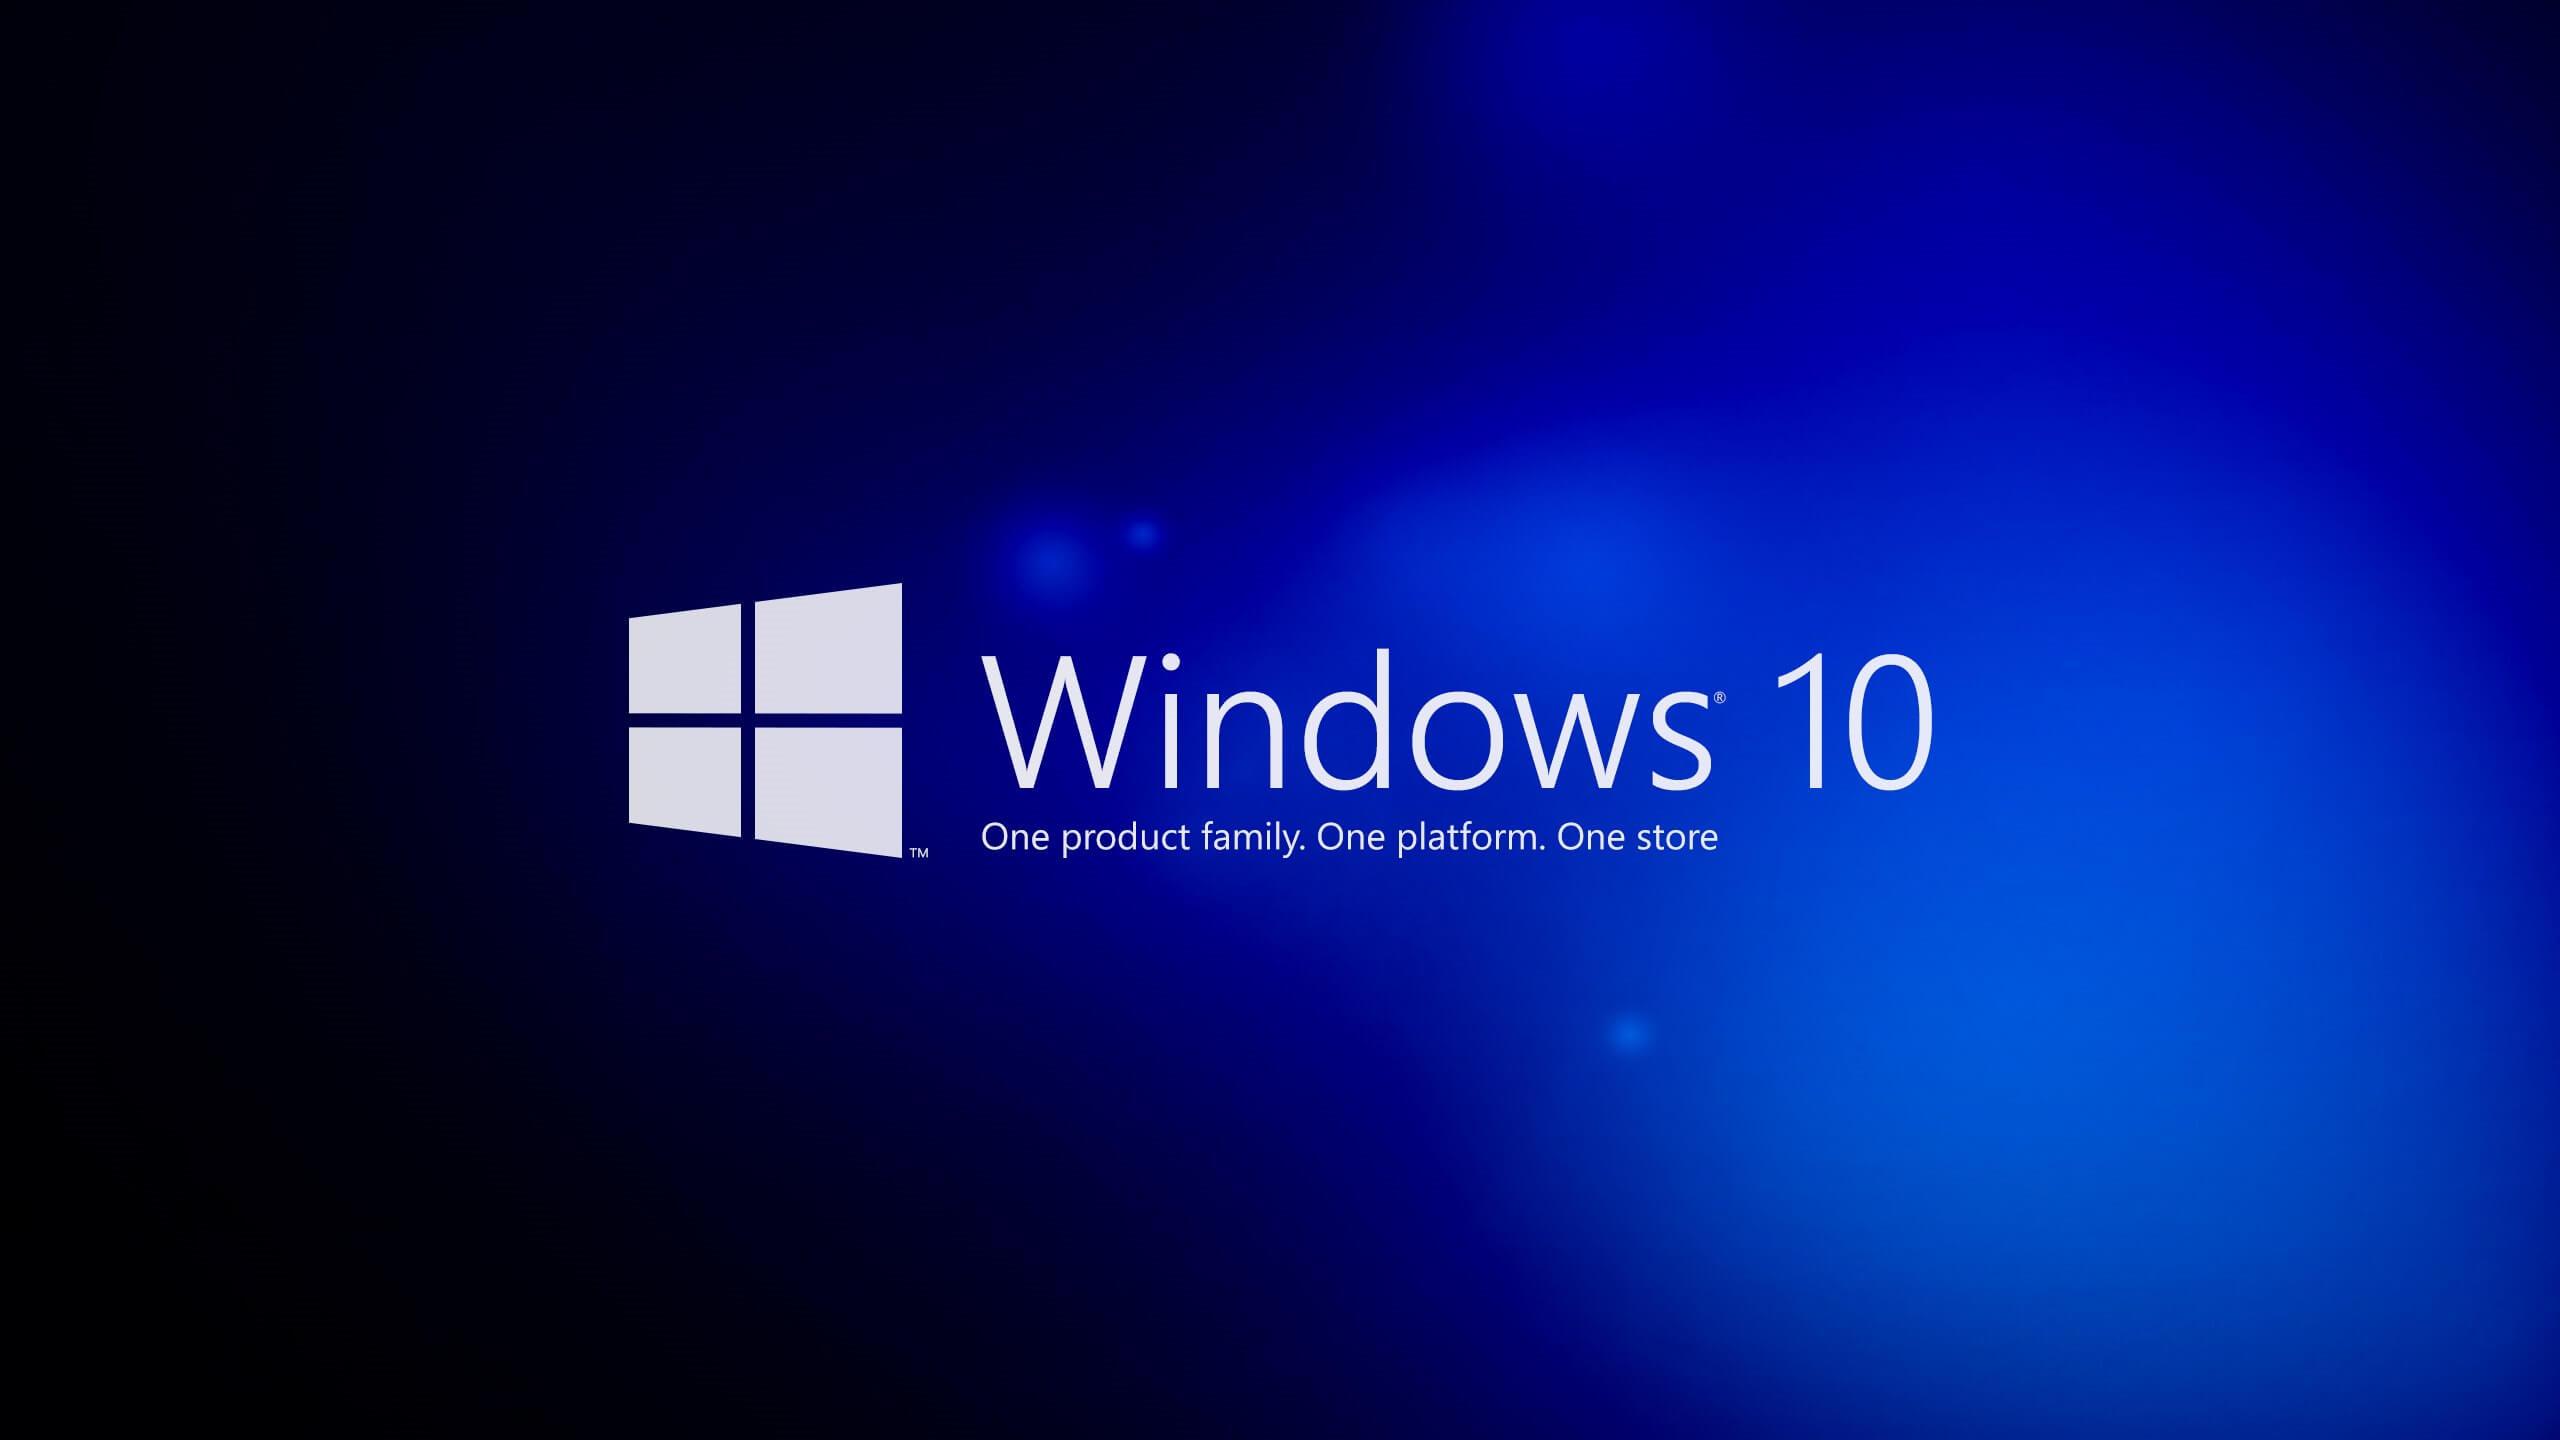 Windows 10 Yönetici İzni Sorma